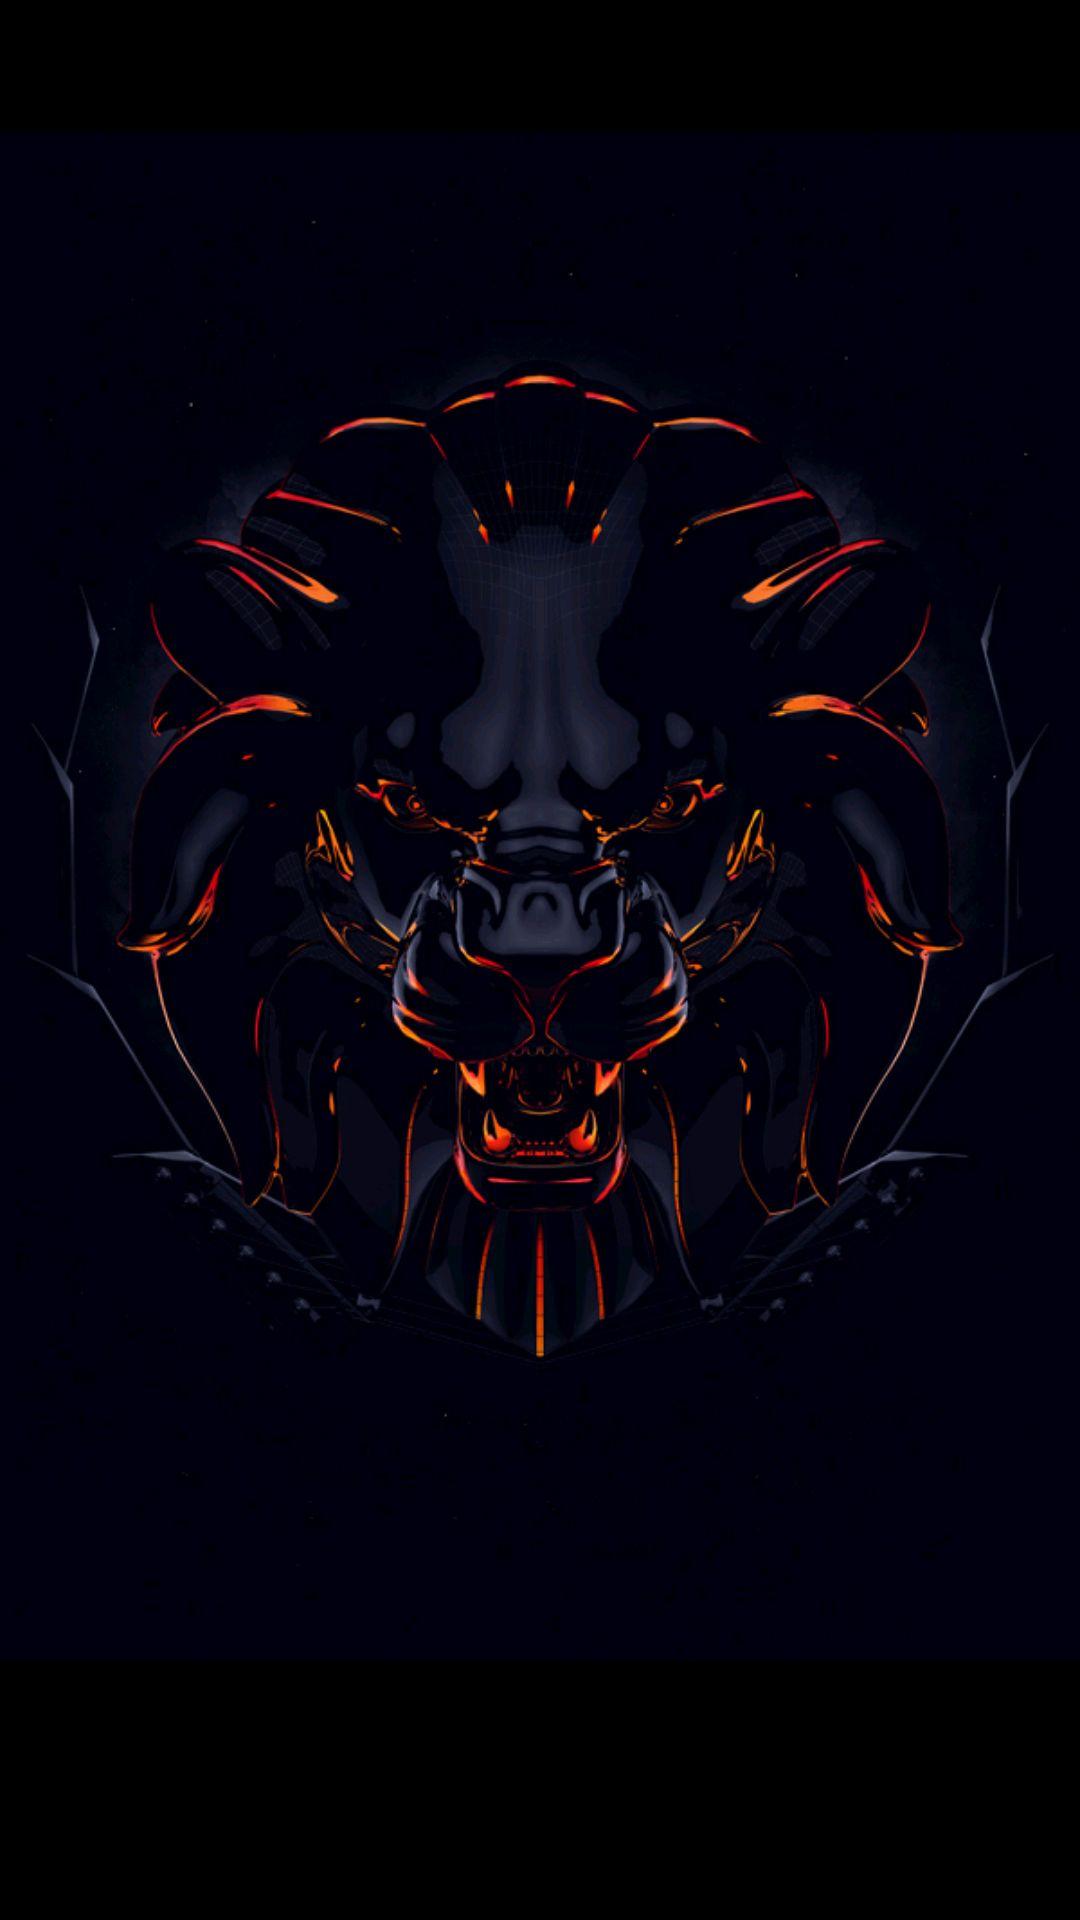 Fractal Art, Darkness, Symmetry, Graphics, Art, Graphic Design